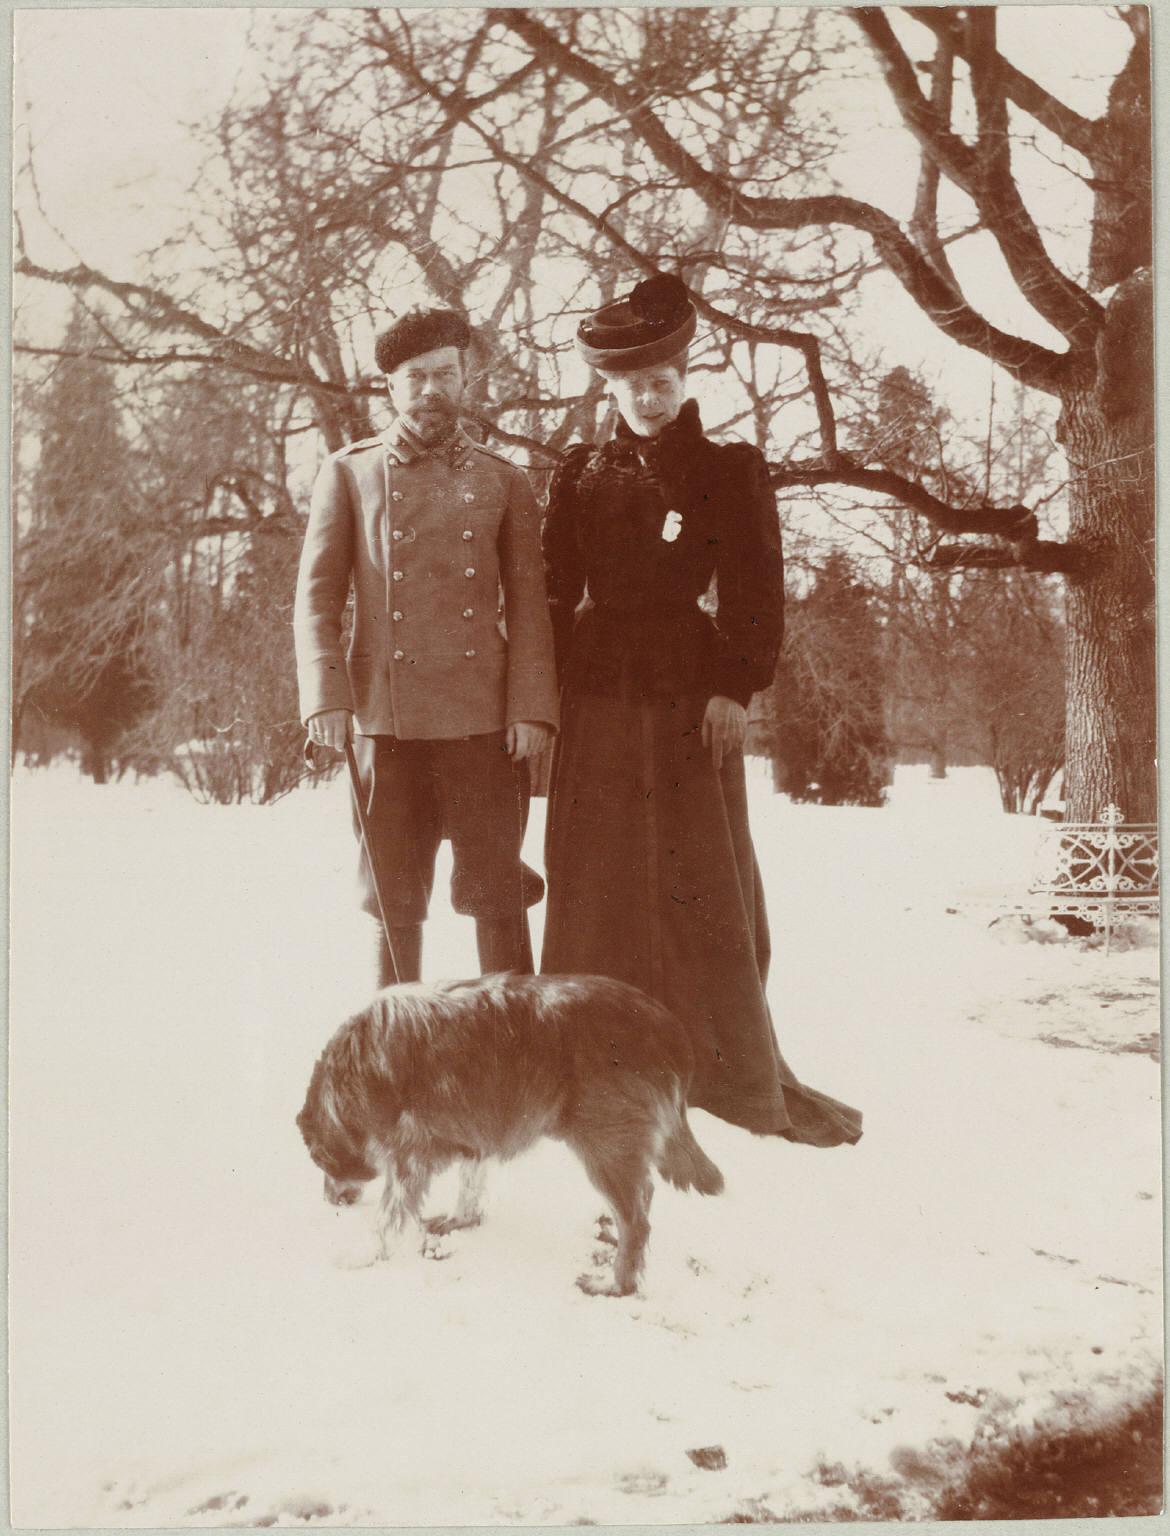 Nicholas and Alexandra - The Romanovs Photo (12206184